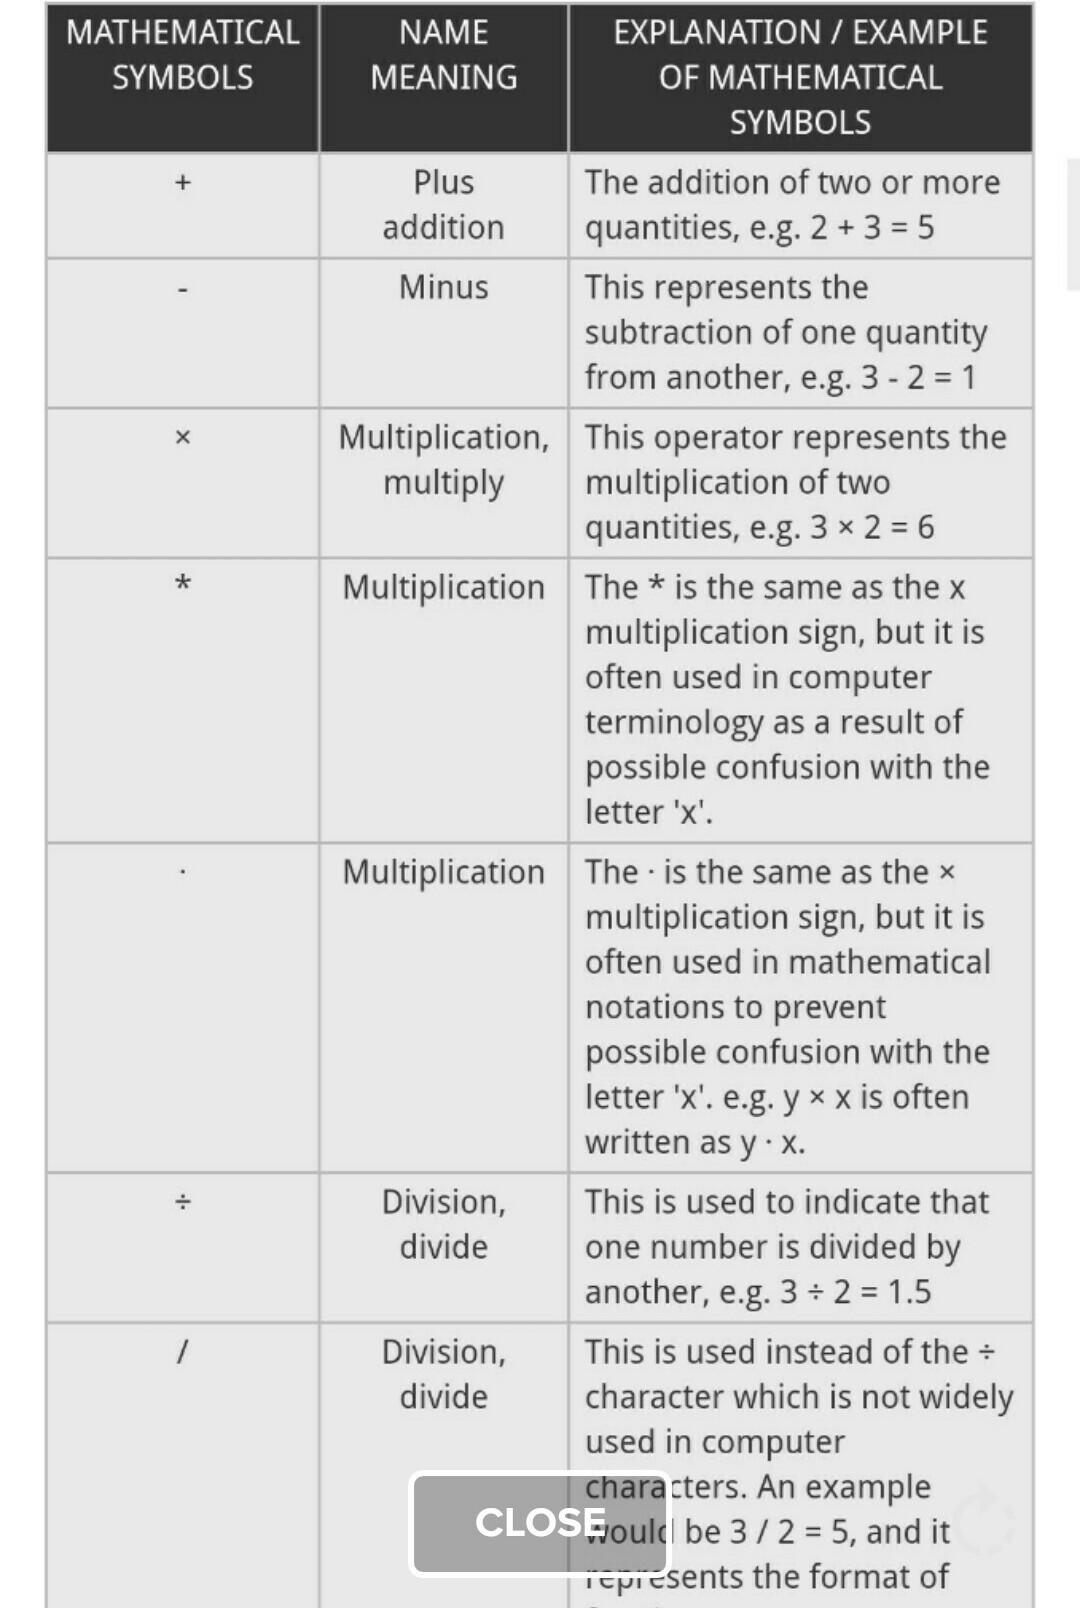 Top 10 Mathematical Symbolsoriginmeaning Use Brainly